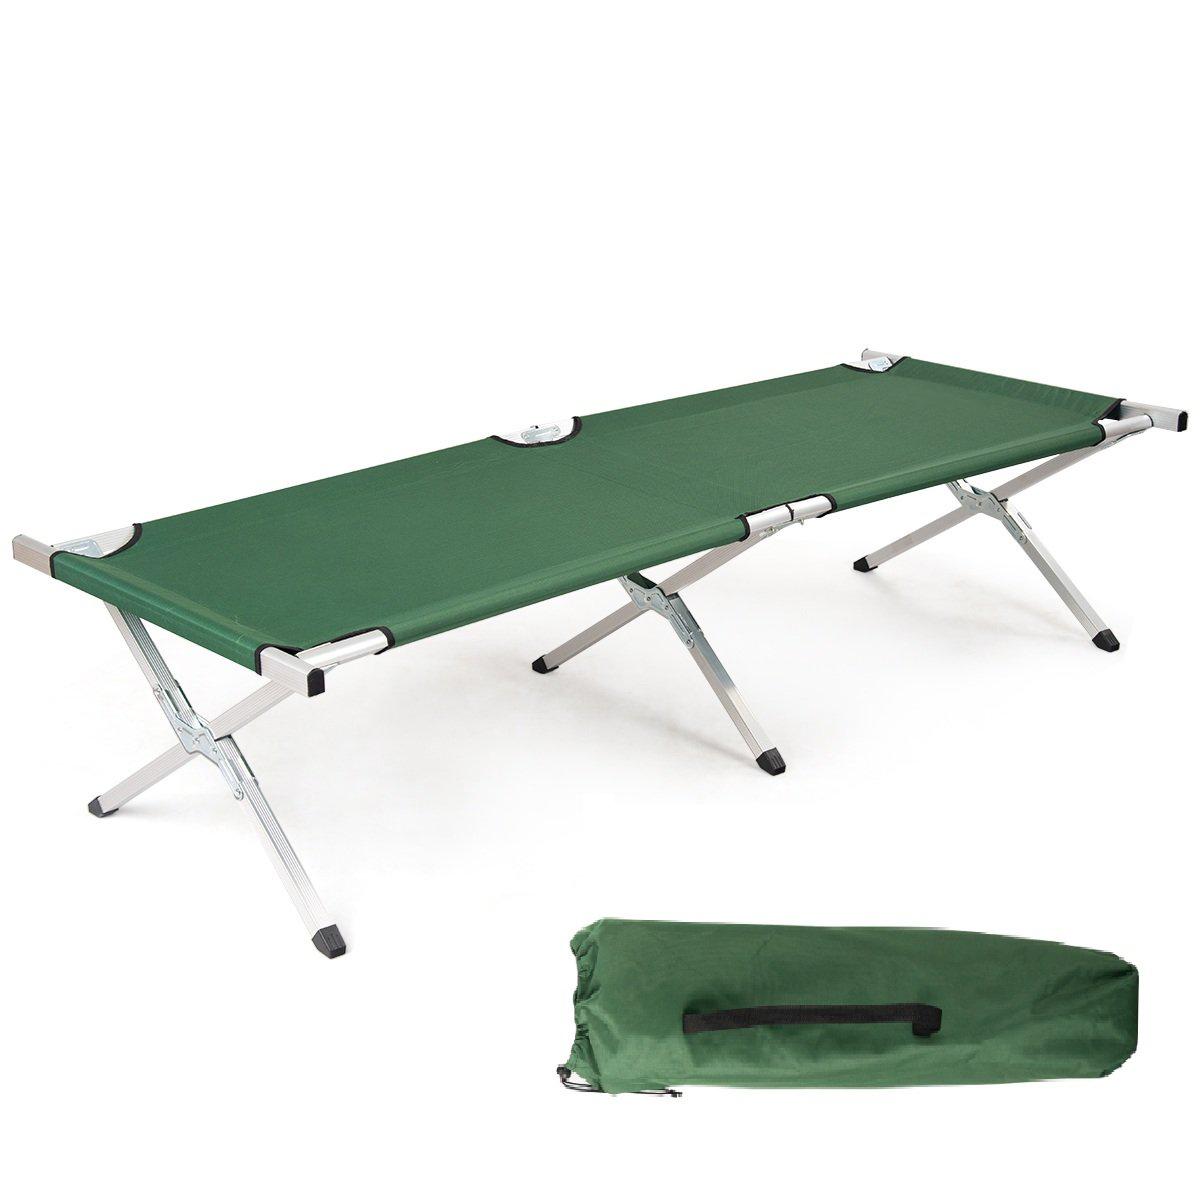 Campingbett klappbar grün